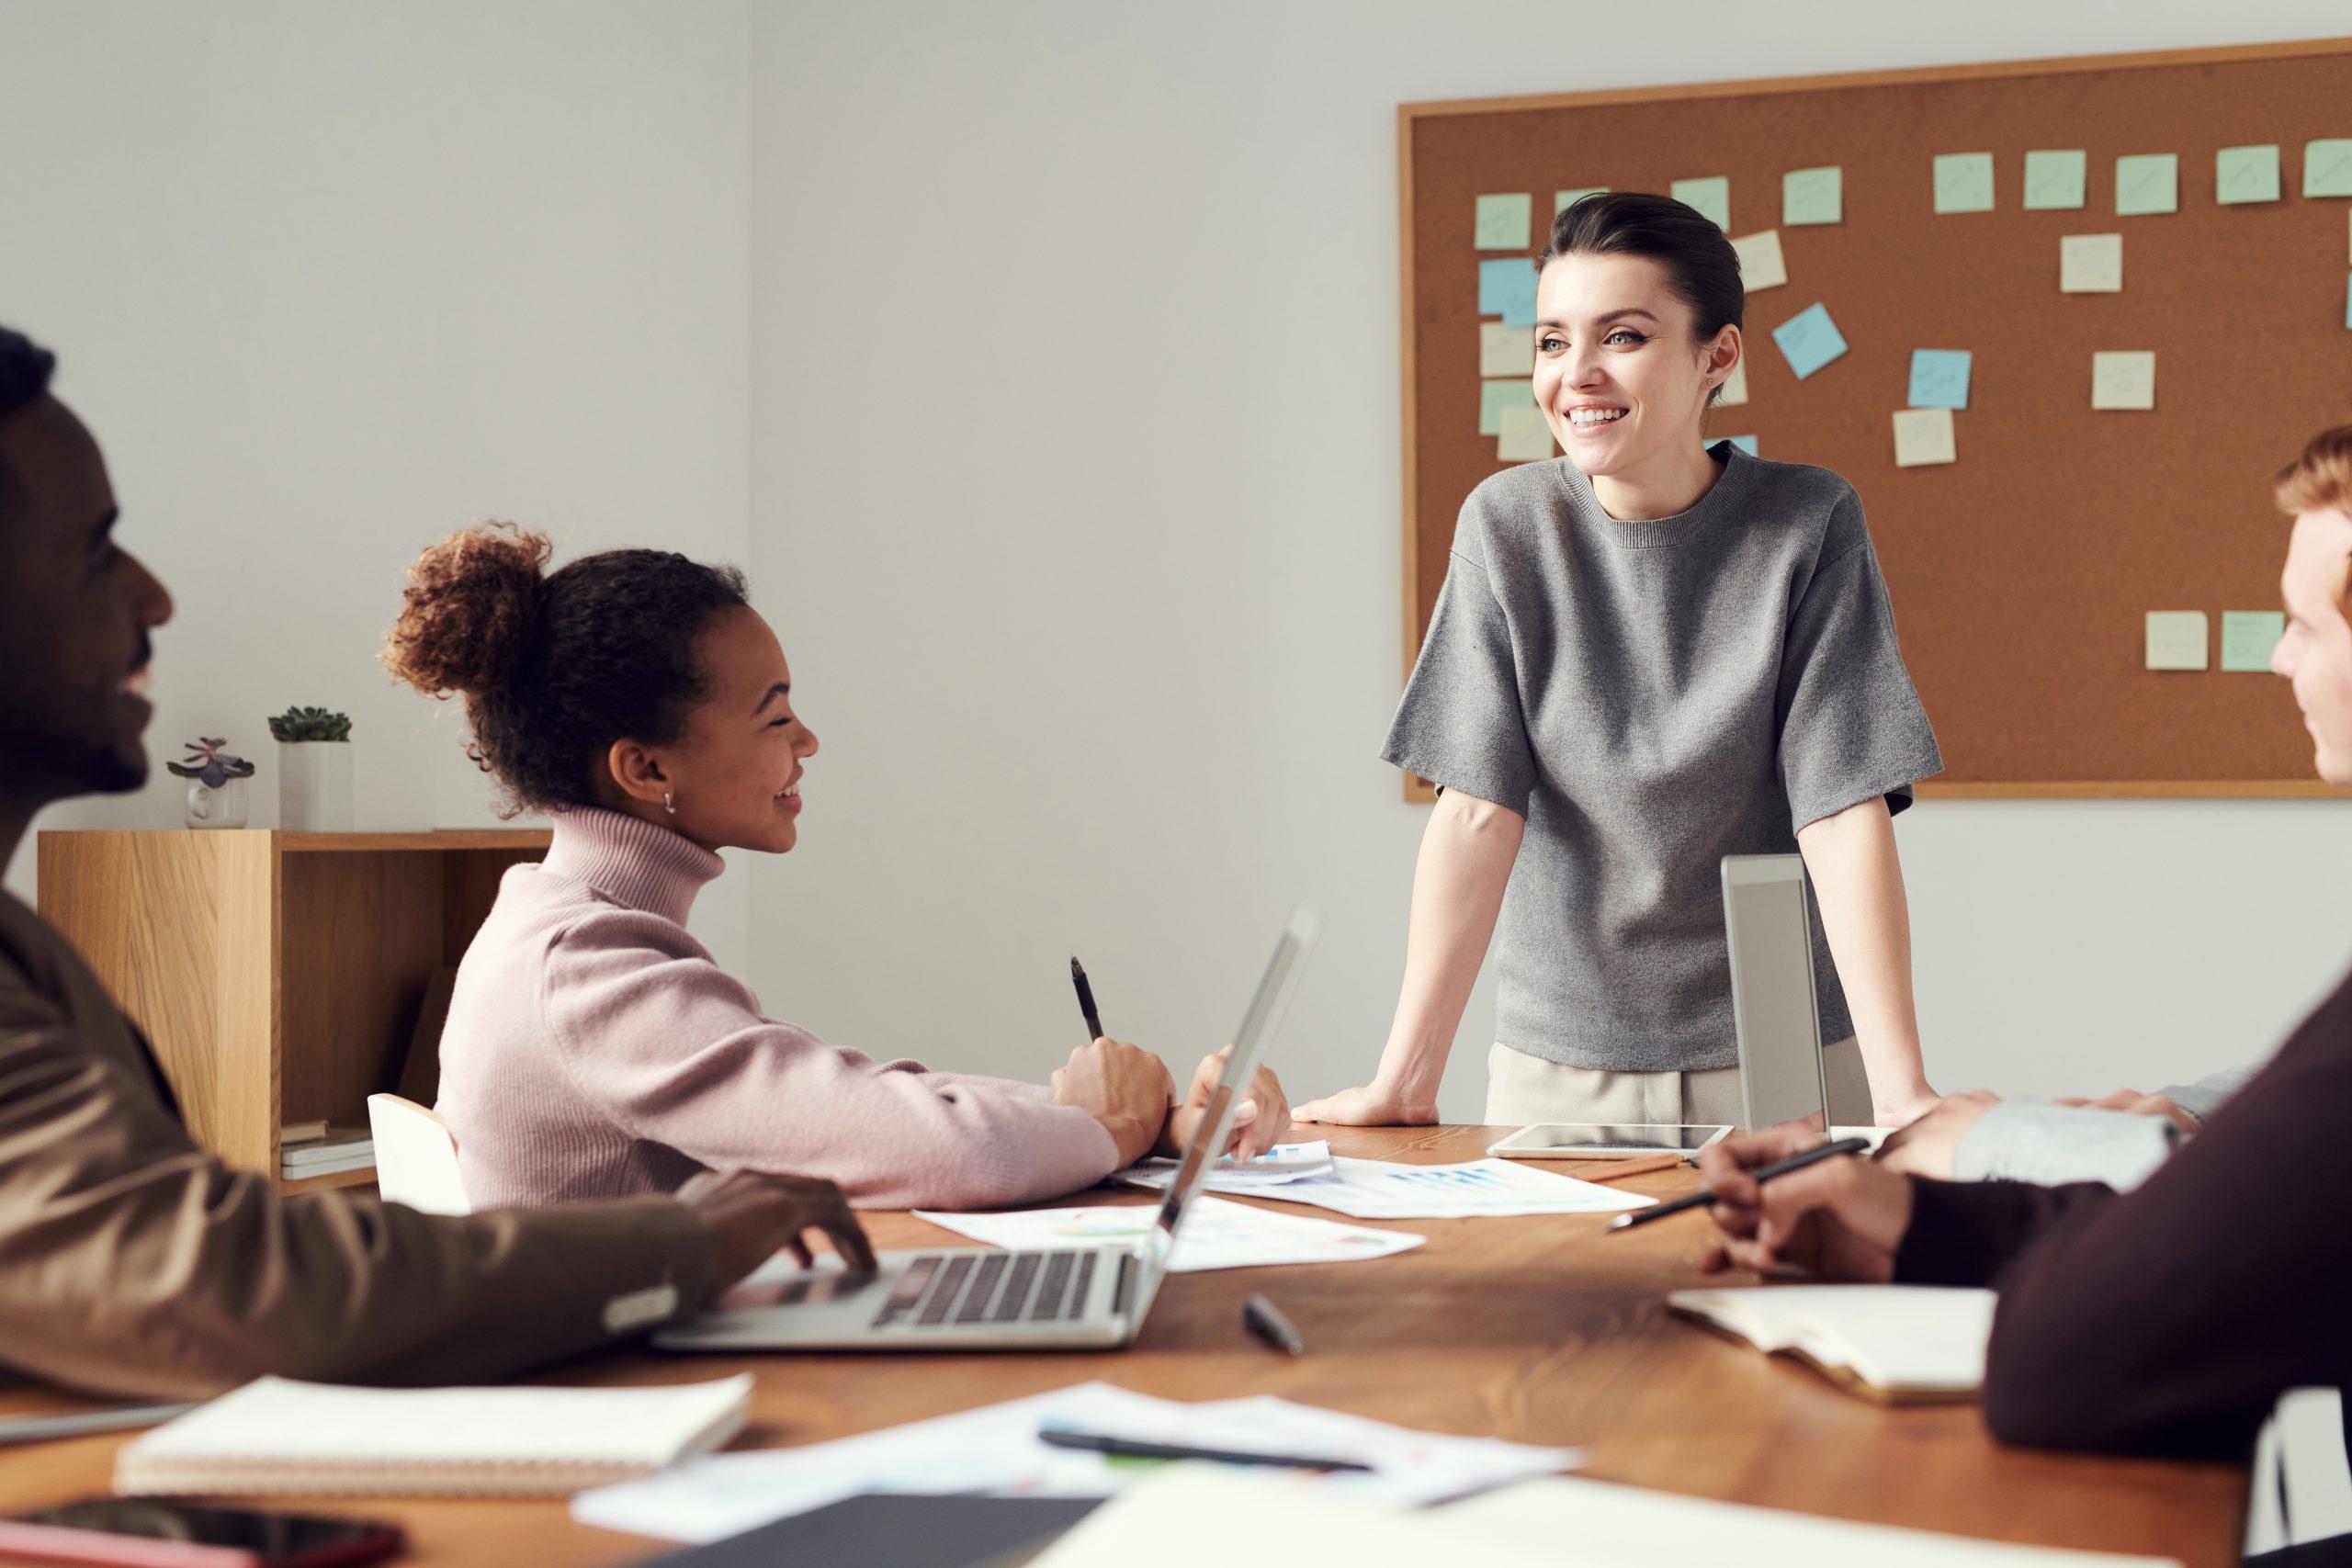 Formation commercial, vente, marketing, INITIATION MANAGEMENT organisme de formation Pyramidia